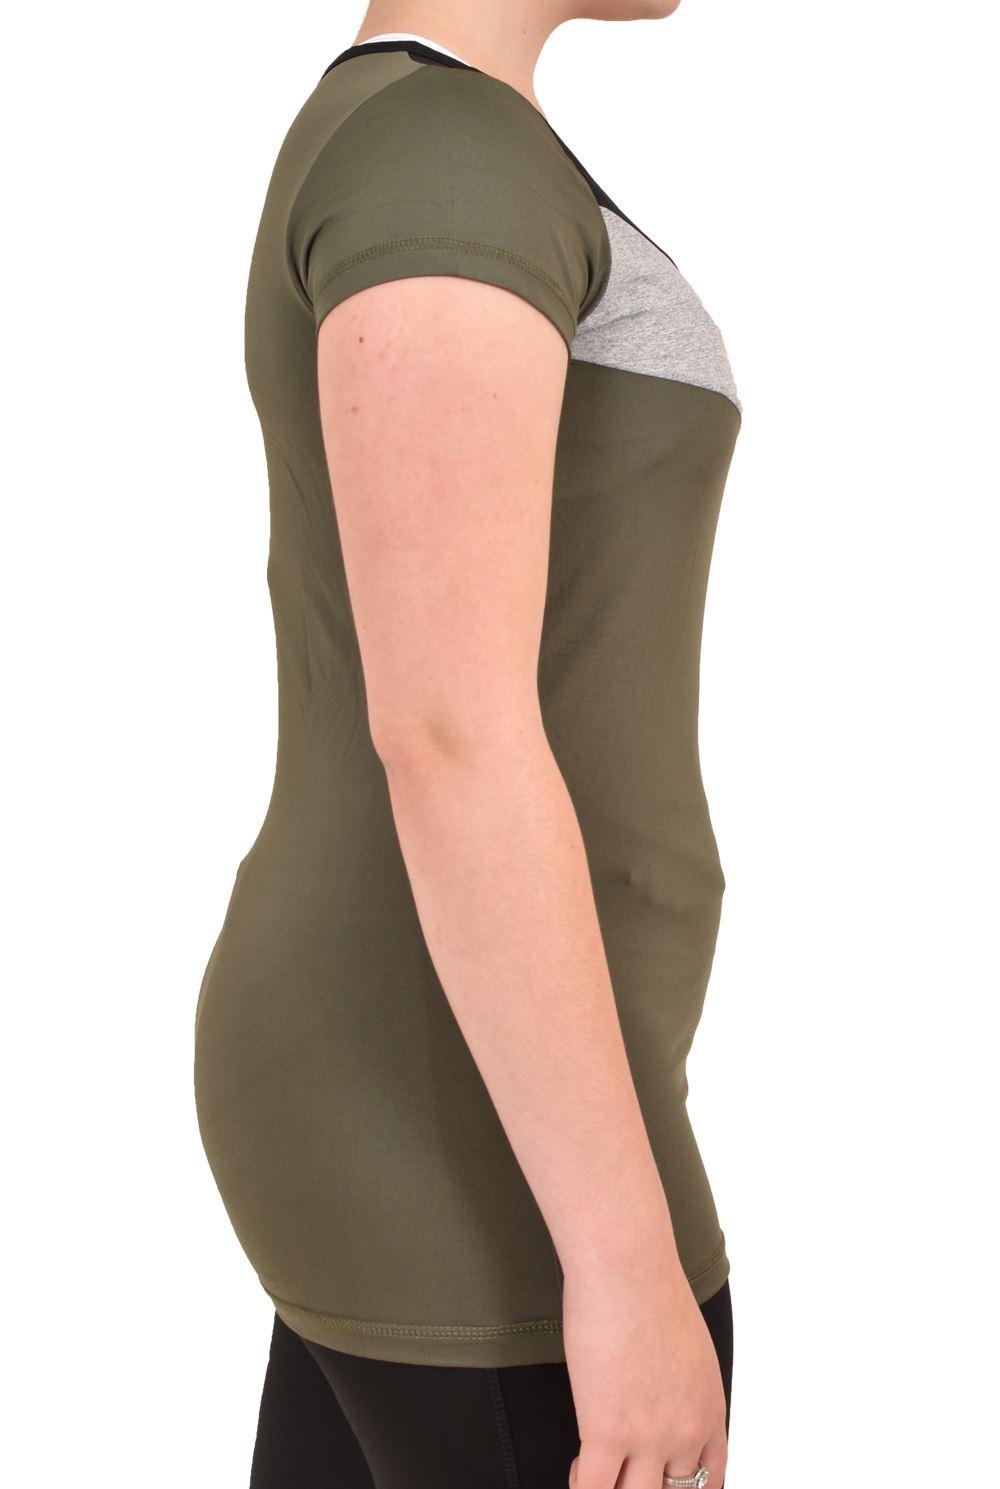 Camiseta-para-mujer-Skechers-Secado-Rapido-Top-senoras-de-Deportes-Activewear-Gimnasio-Fitness-Dance miniatura 10